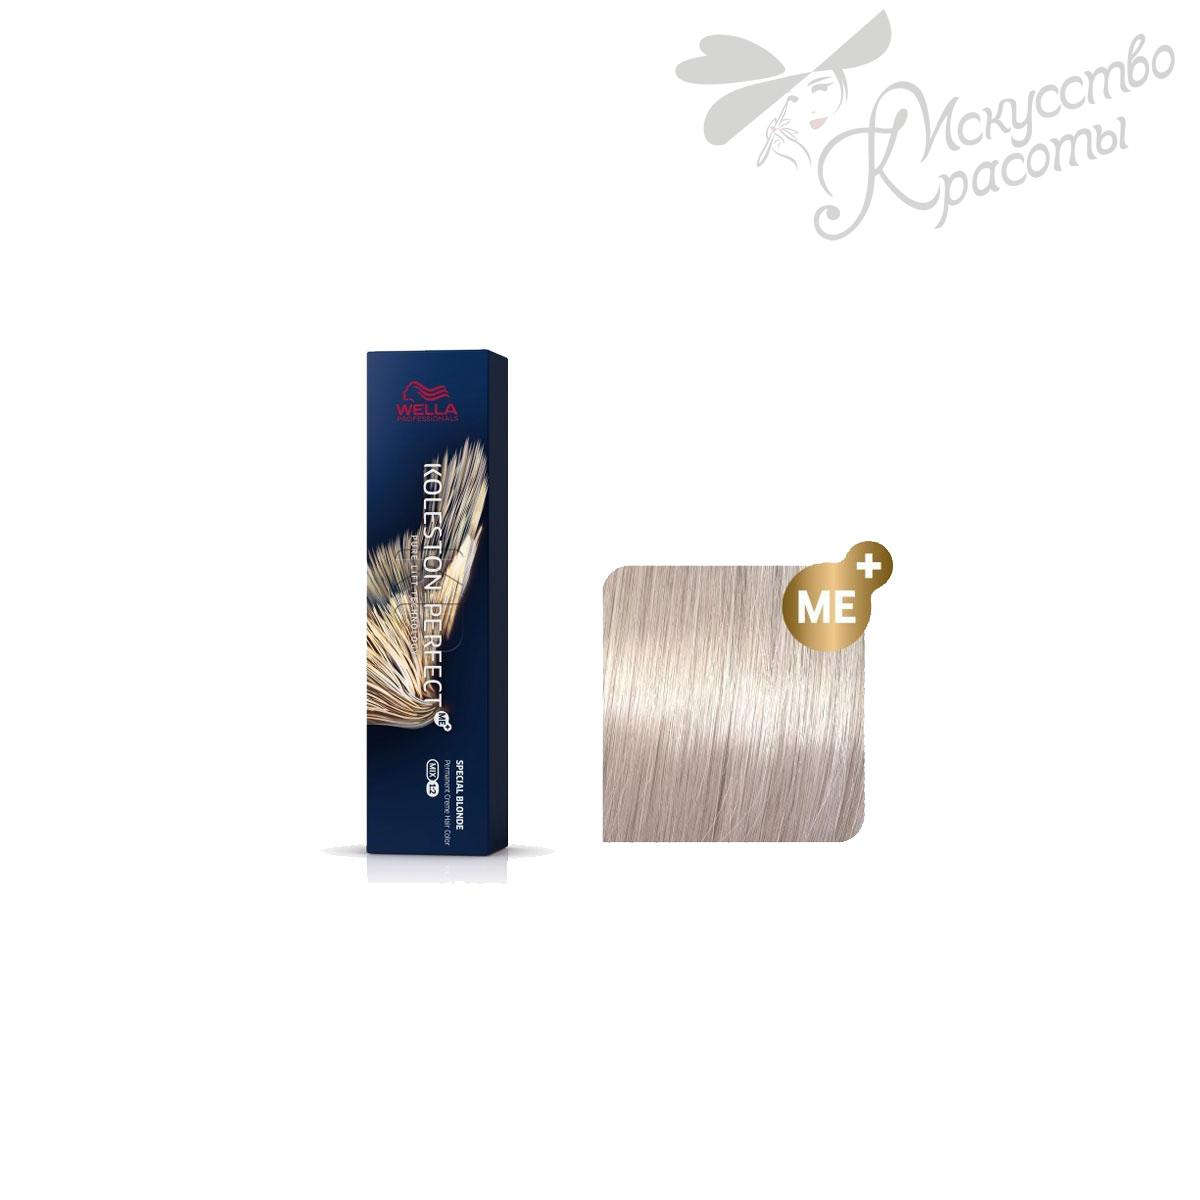 Wella Koleston Special blond 12/16 пепельно-фиолетовый 60 мл